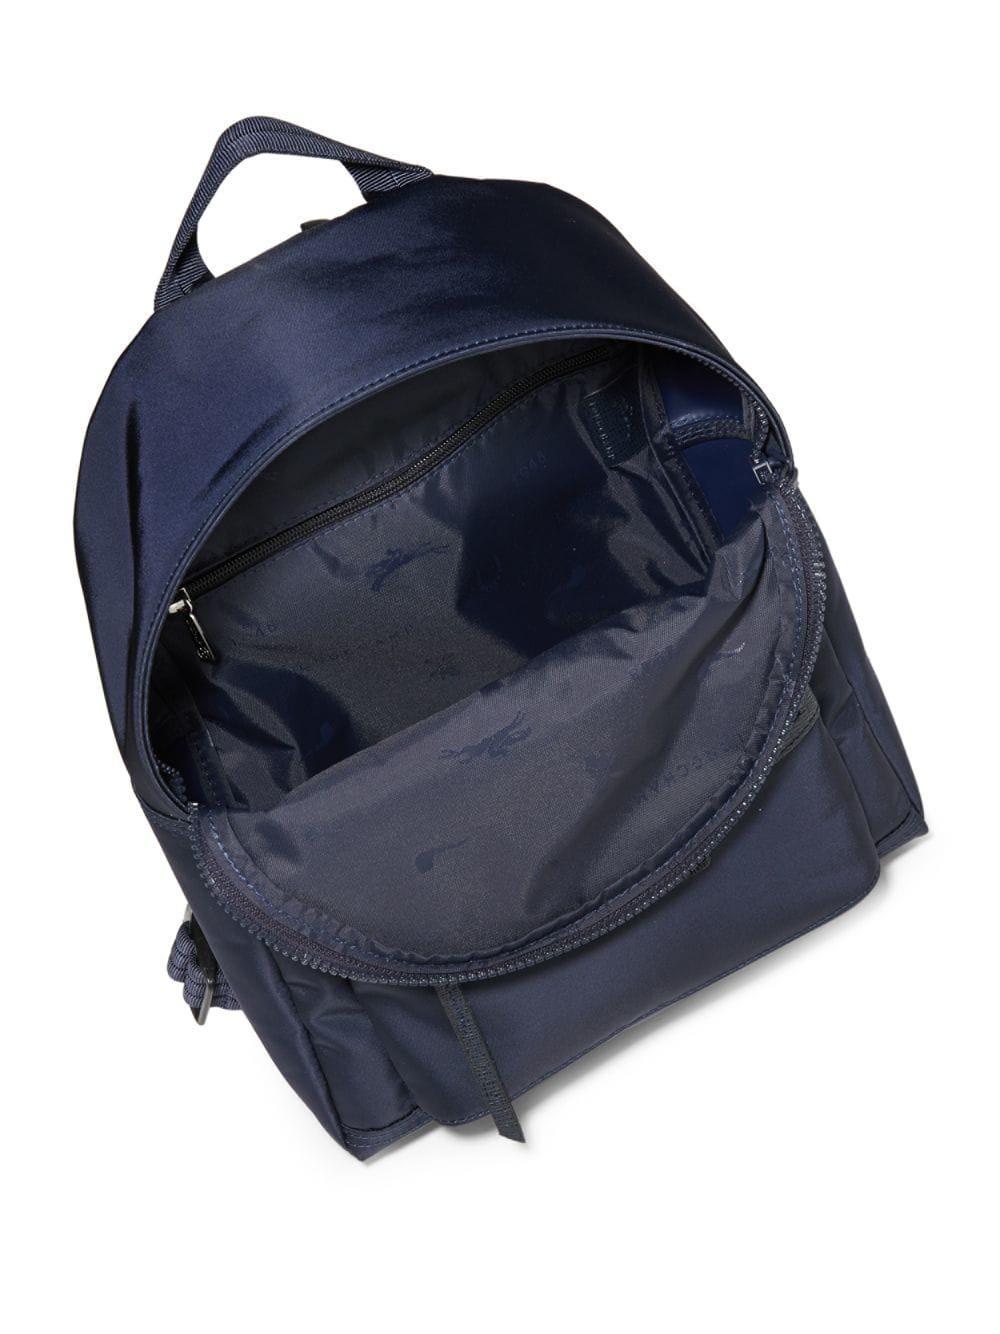 790b4cbf4ea2e Longchamp Small Le Pliage Neo Backpack in Blue - Save 15% - Lyst